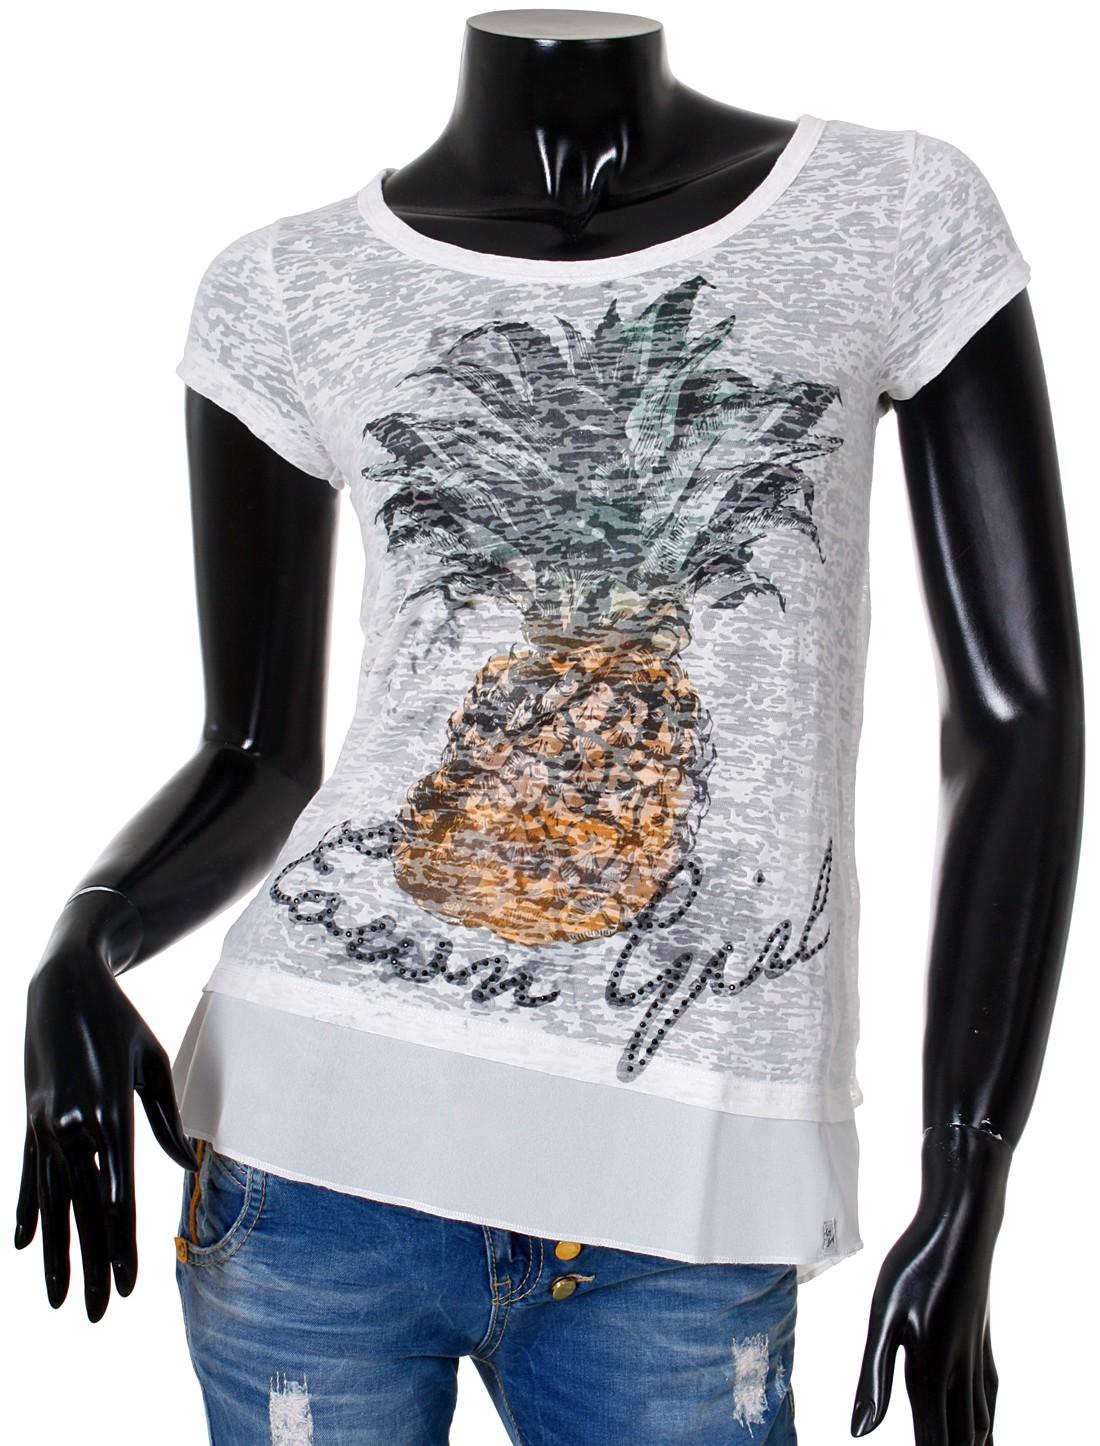 key largo damen t shirt fruit vintage strasss look 2in1 double look optik cherry ebay. Black Bedroom Furniture Sets. Home Design Ideas